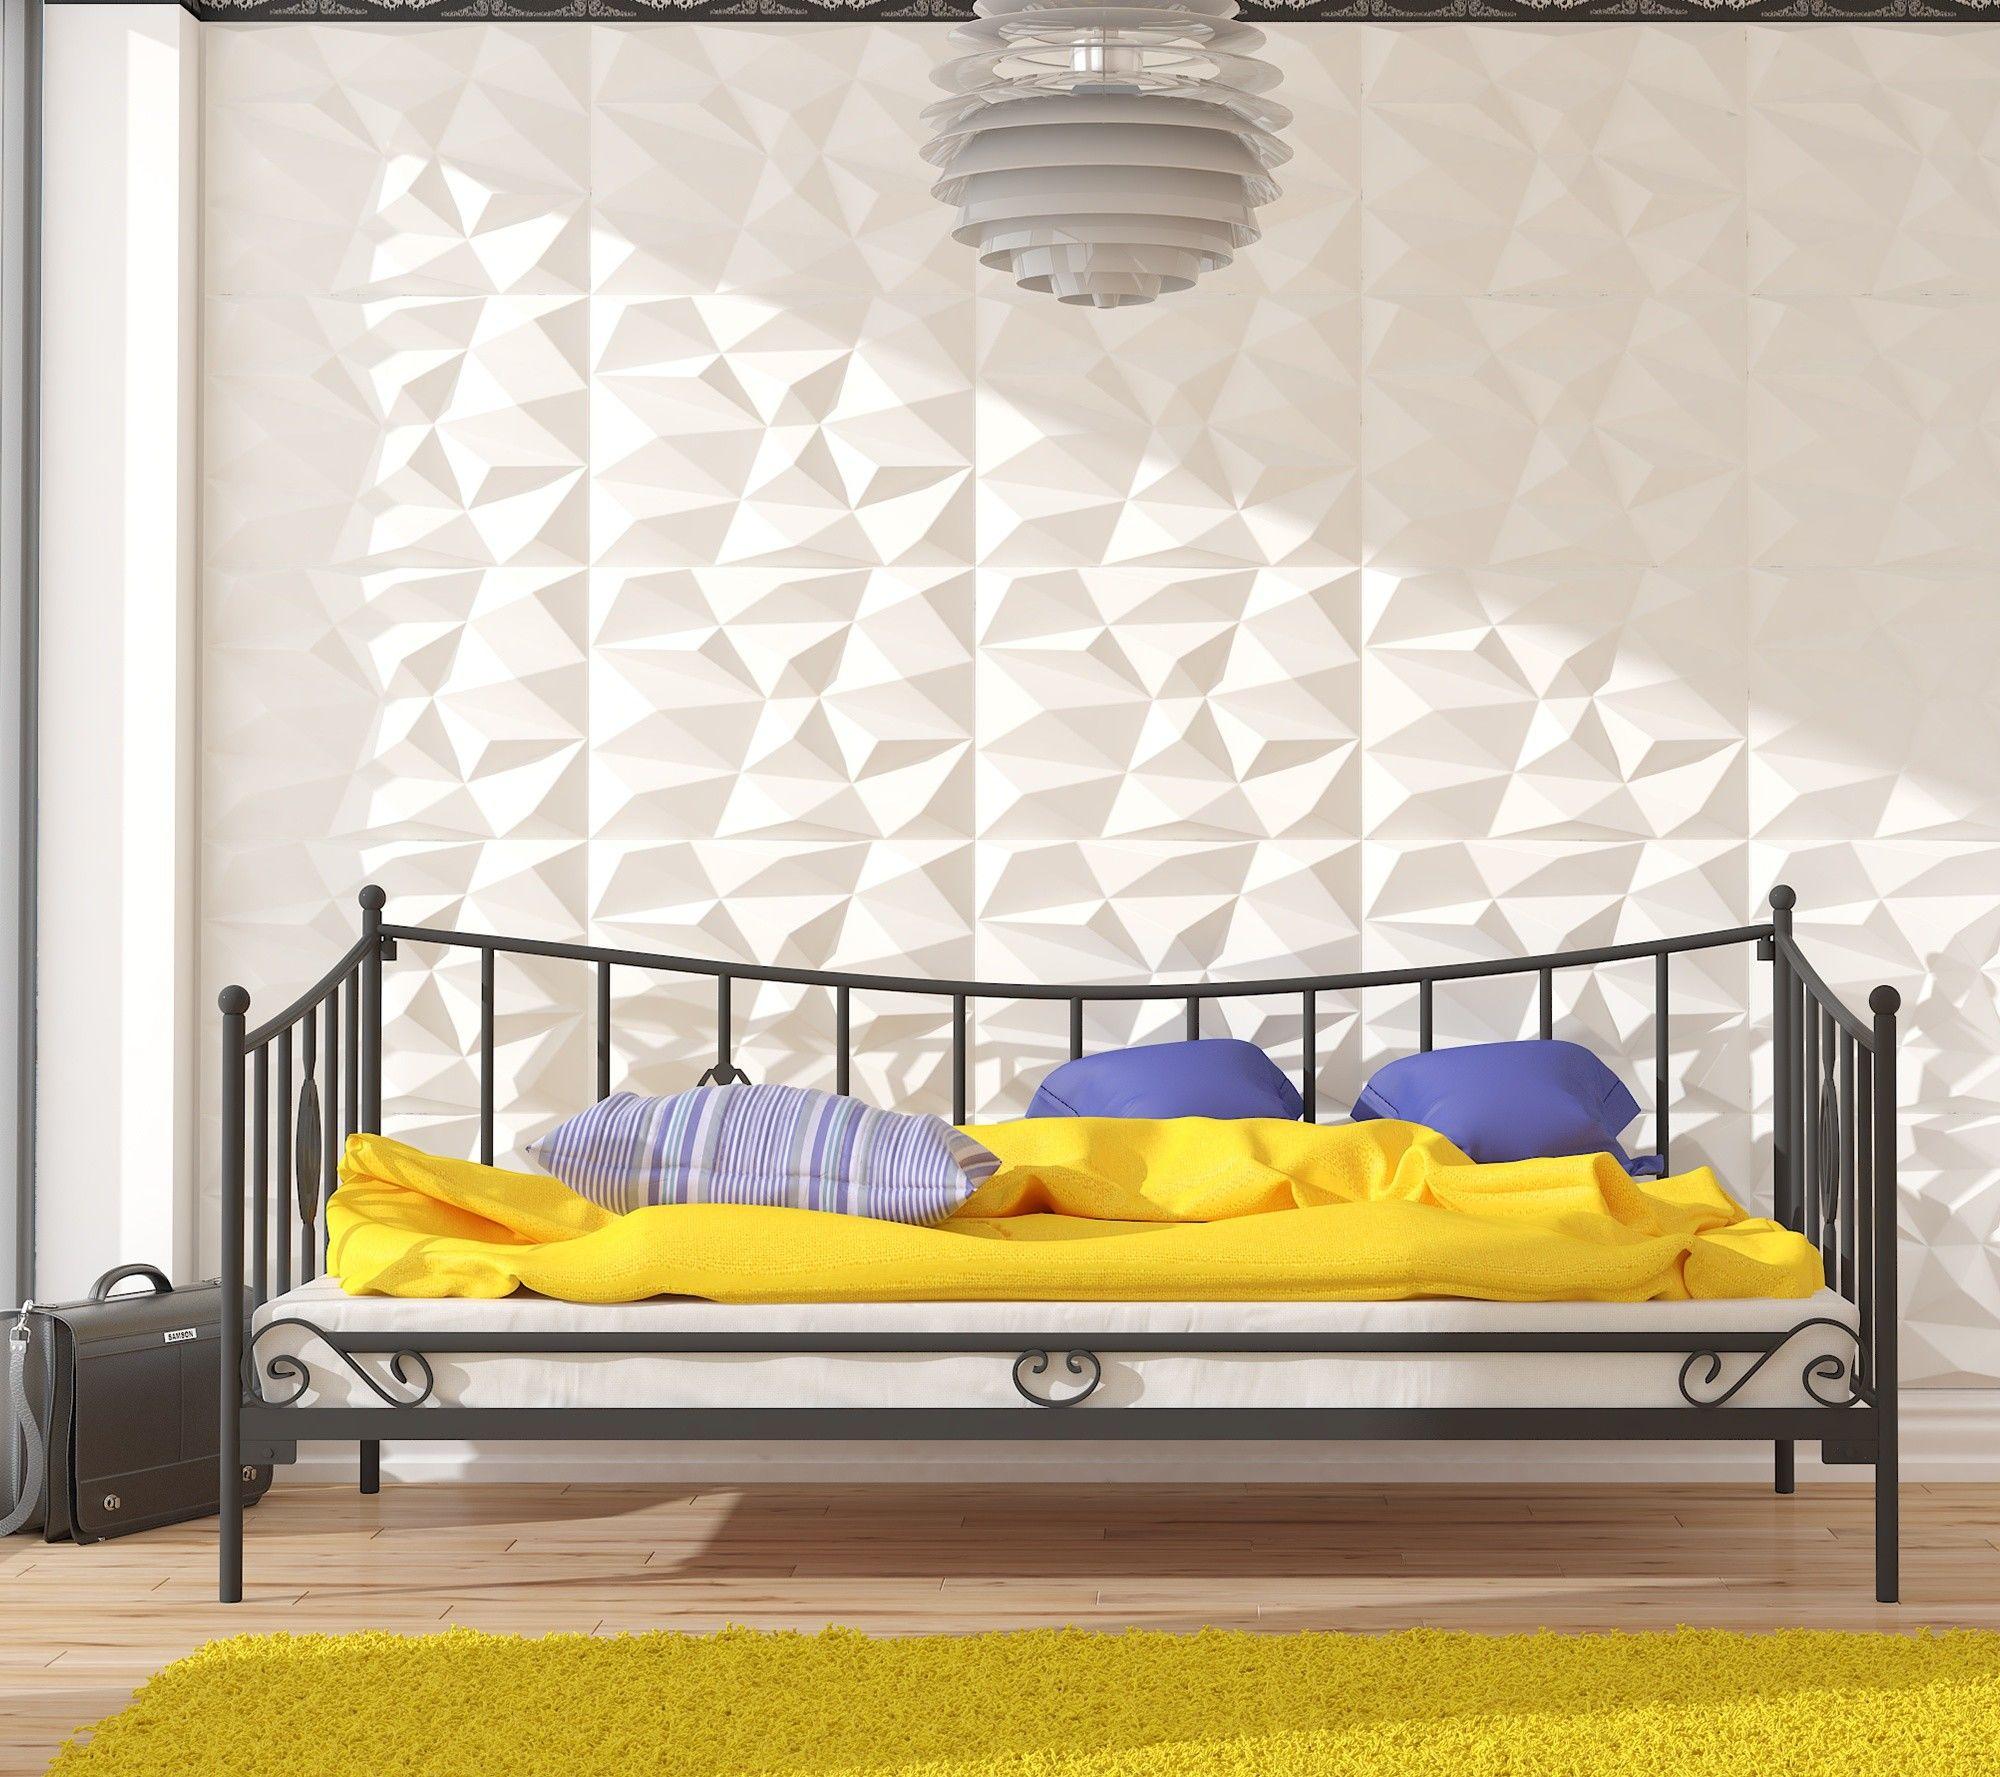 Łóżko metalowe sofa 90x200 wzór 31 ze stelażem